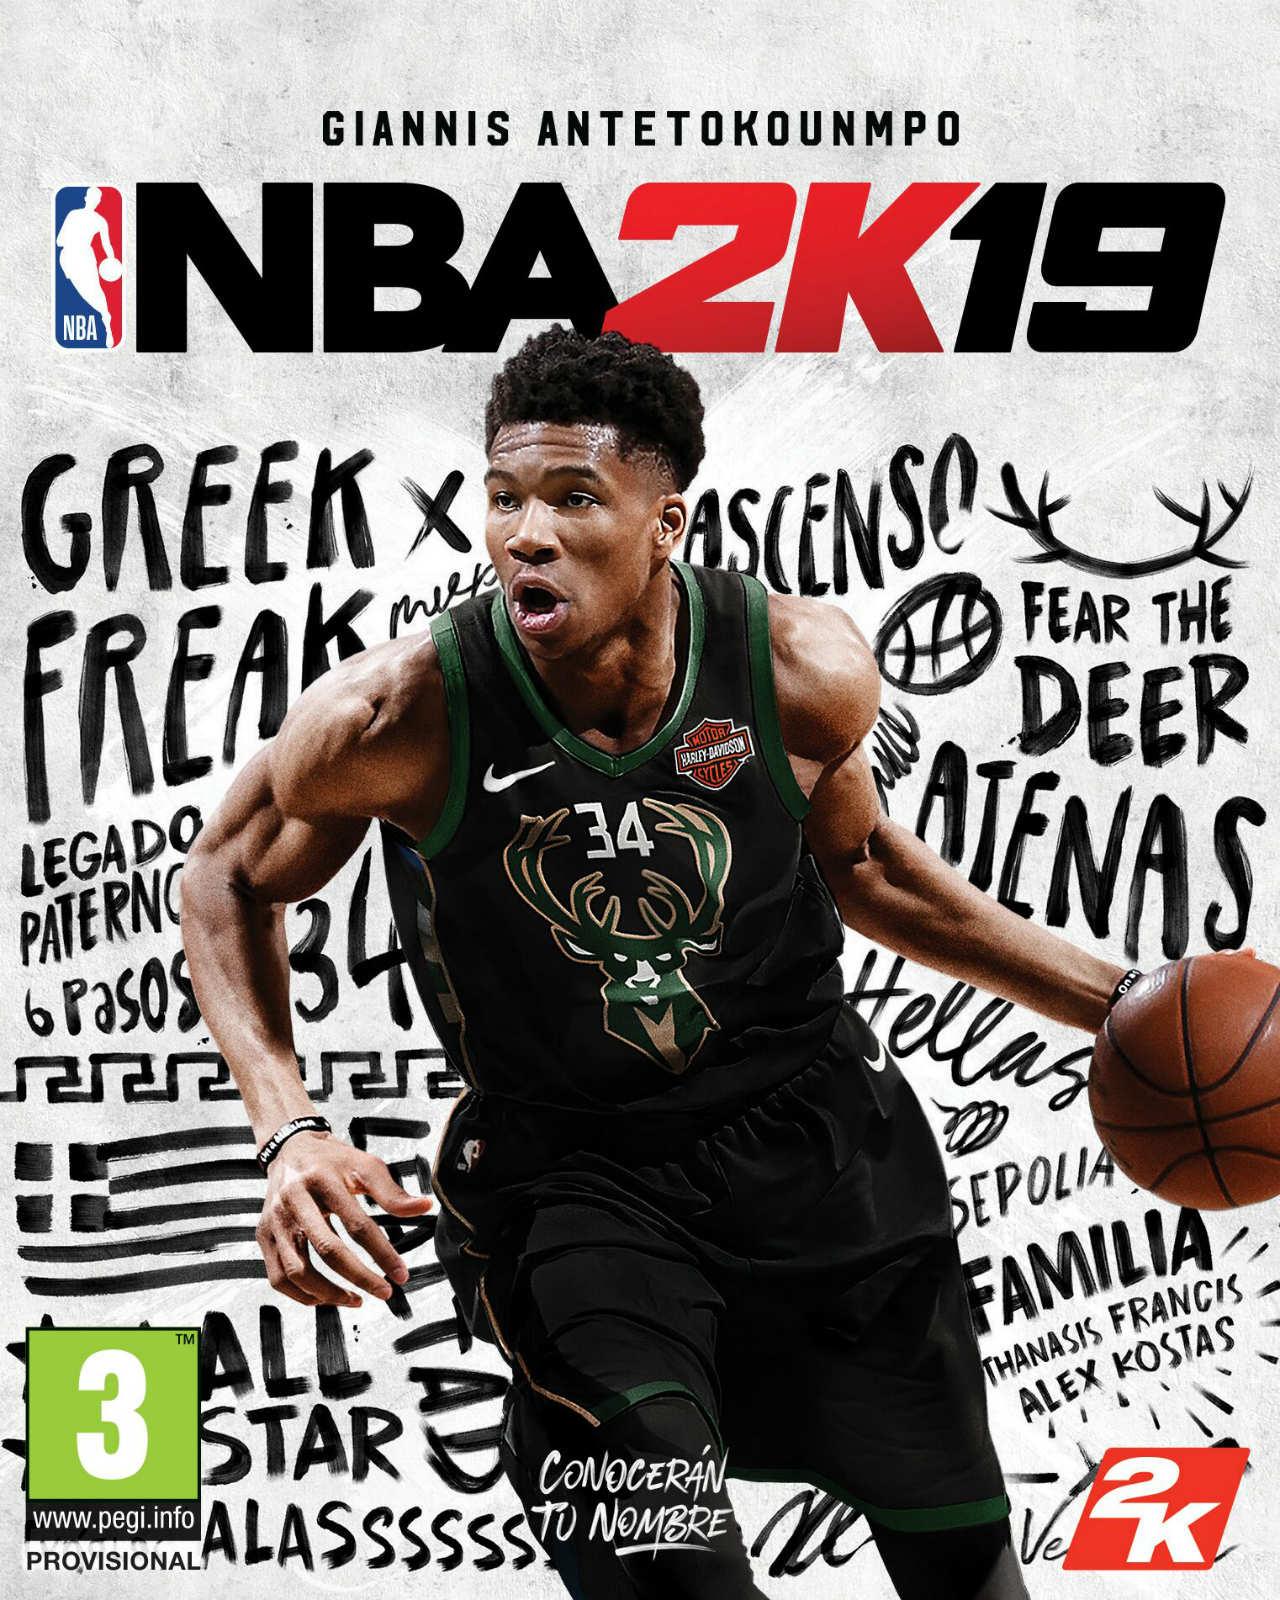 Giannis Antetokounmpo protagonizará la portada de NBA 2K19